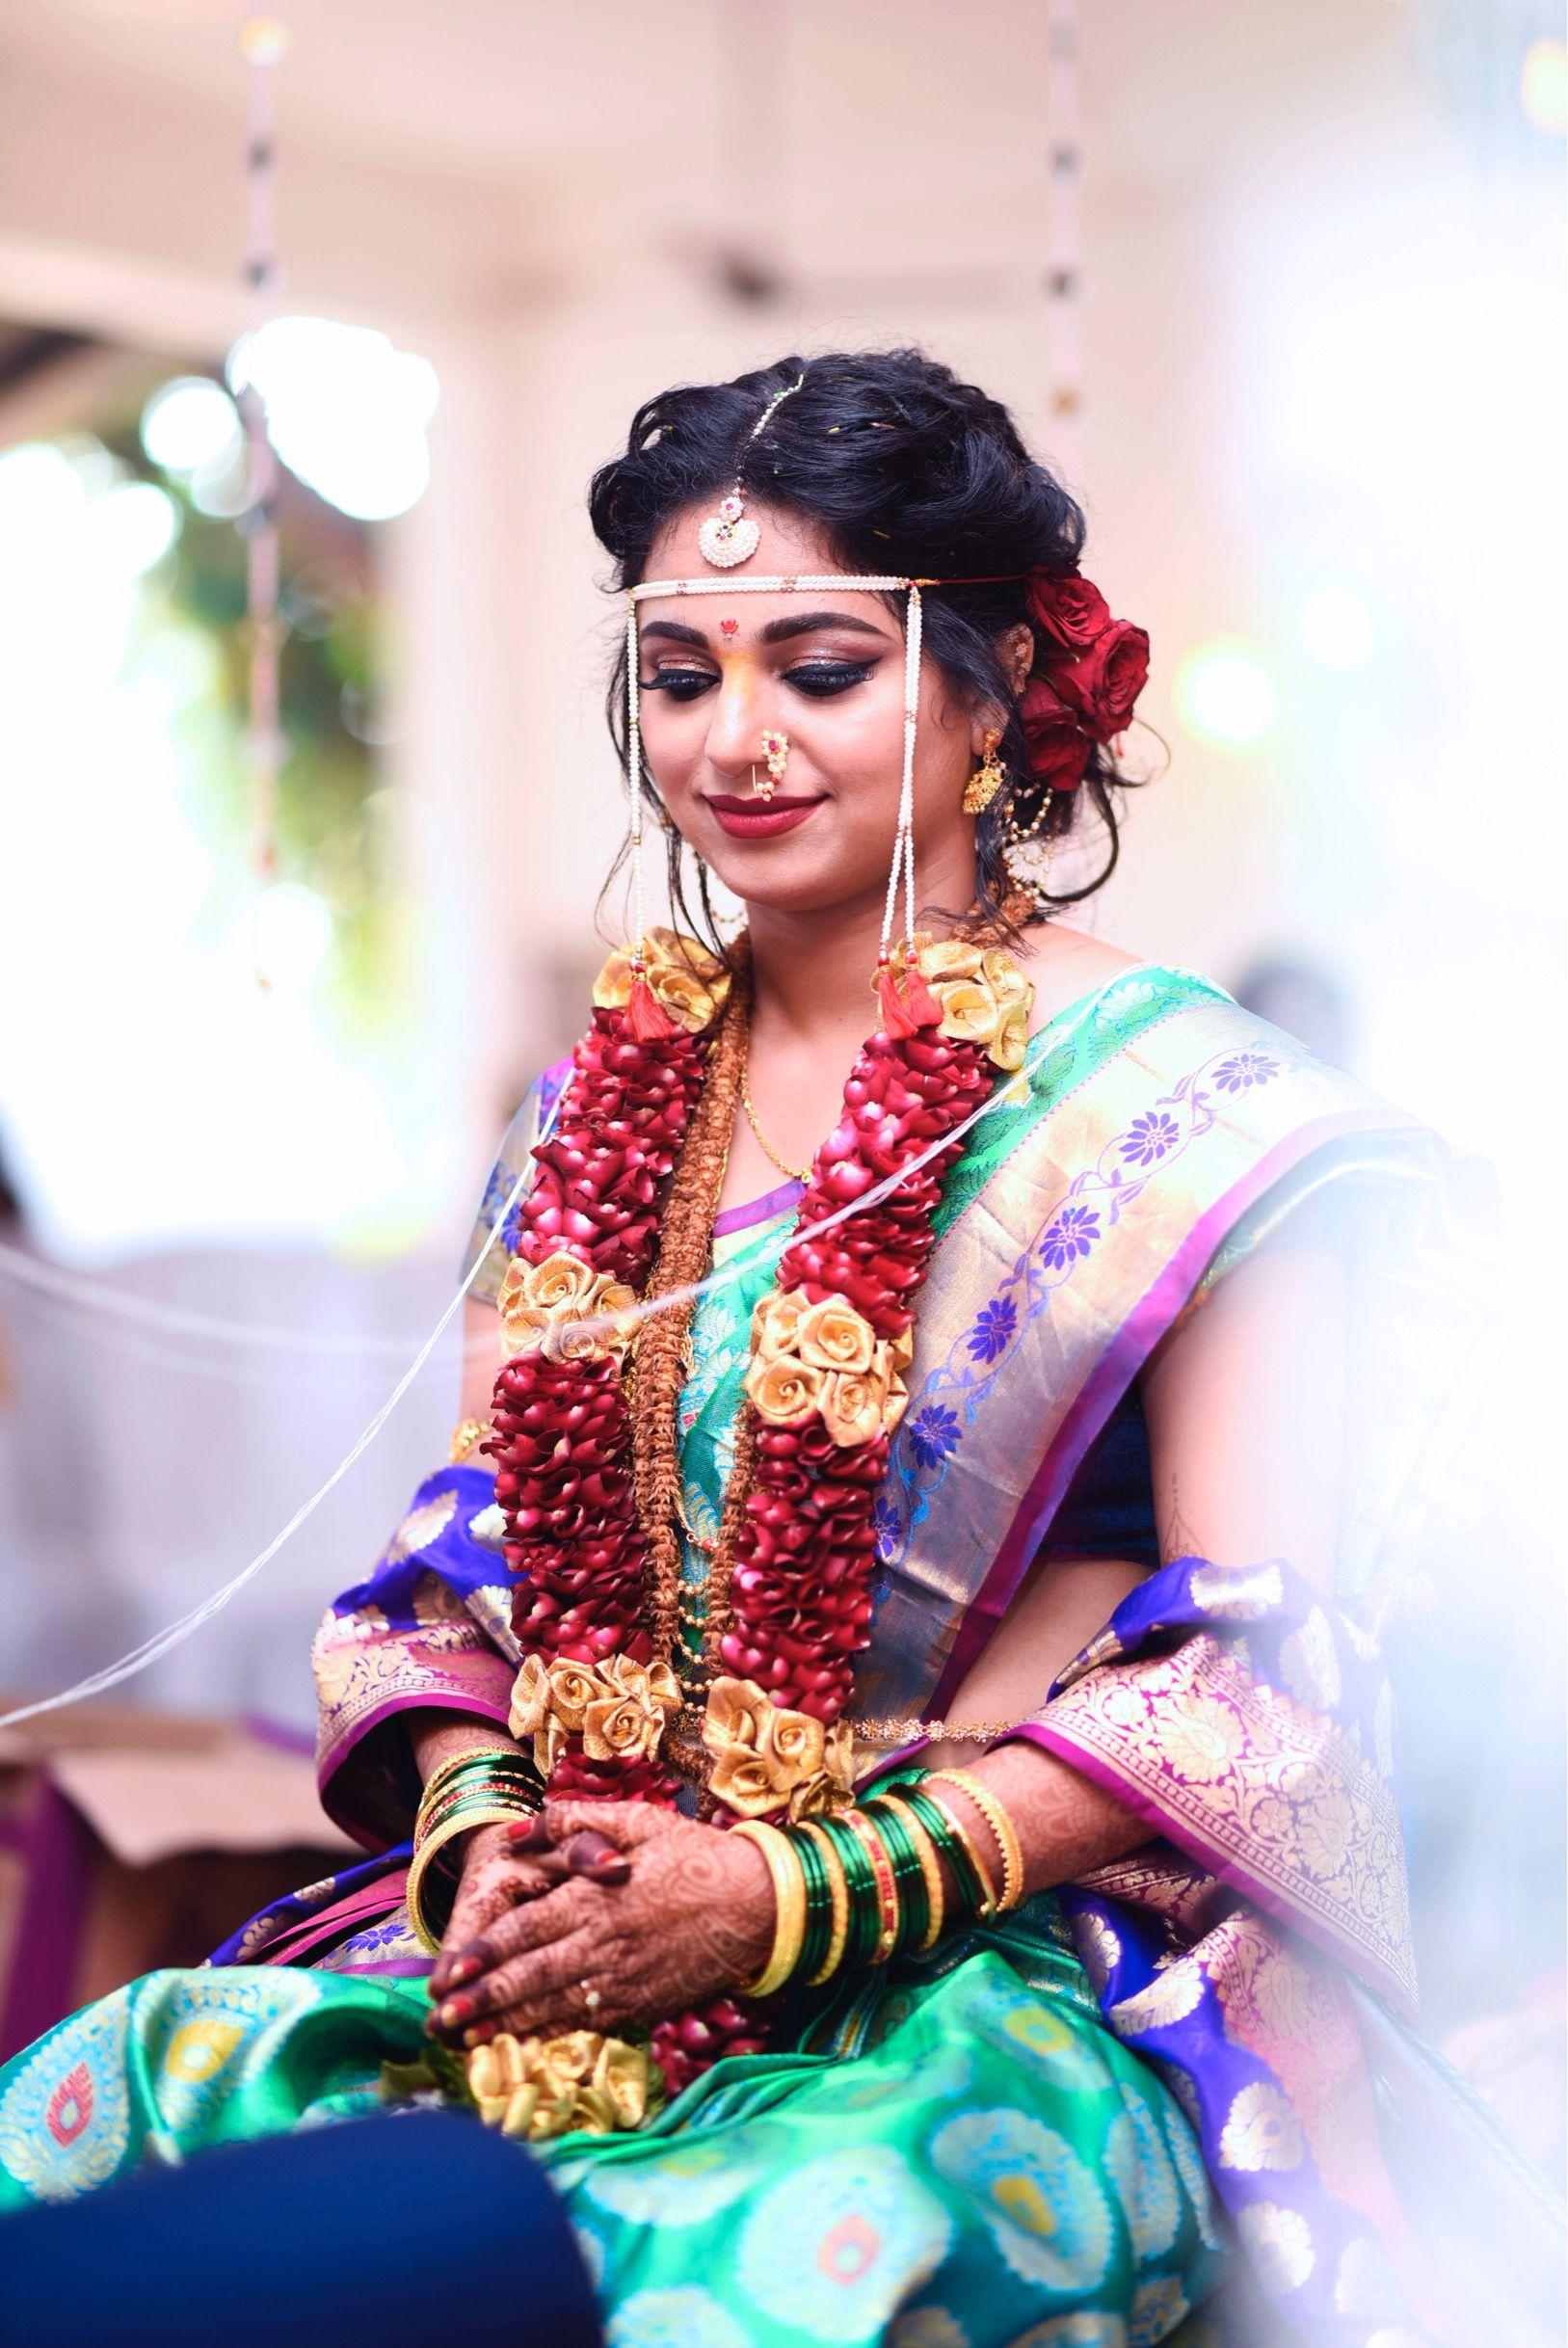 Maharashtrian Bridal Makeup and Hair by @makeoversbysukanya #makeup #bride  #maharashtrianbride #br… | Bridal wear, Indian wedding photography couples, Marathi  bride